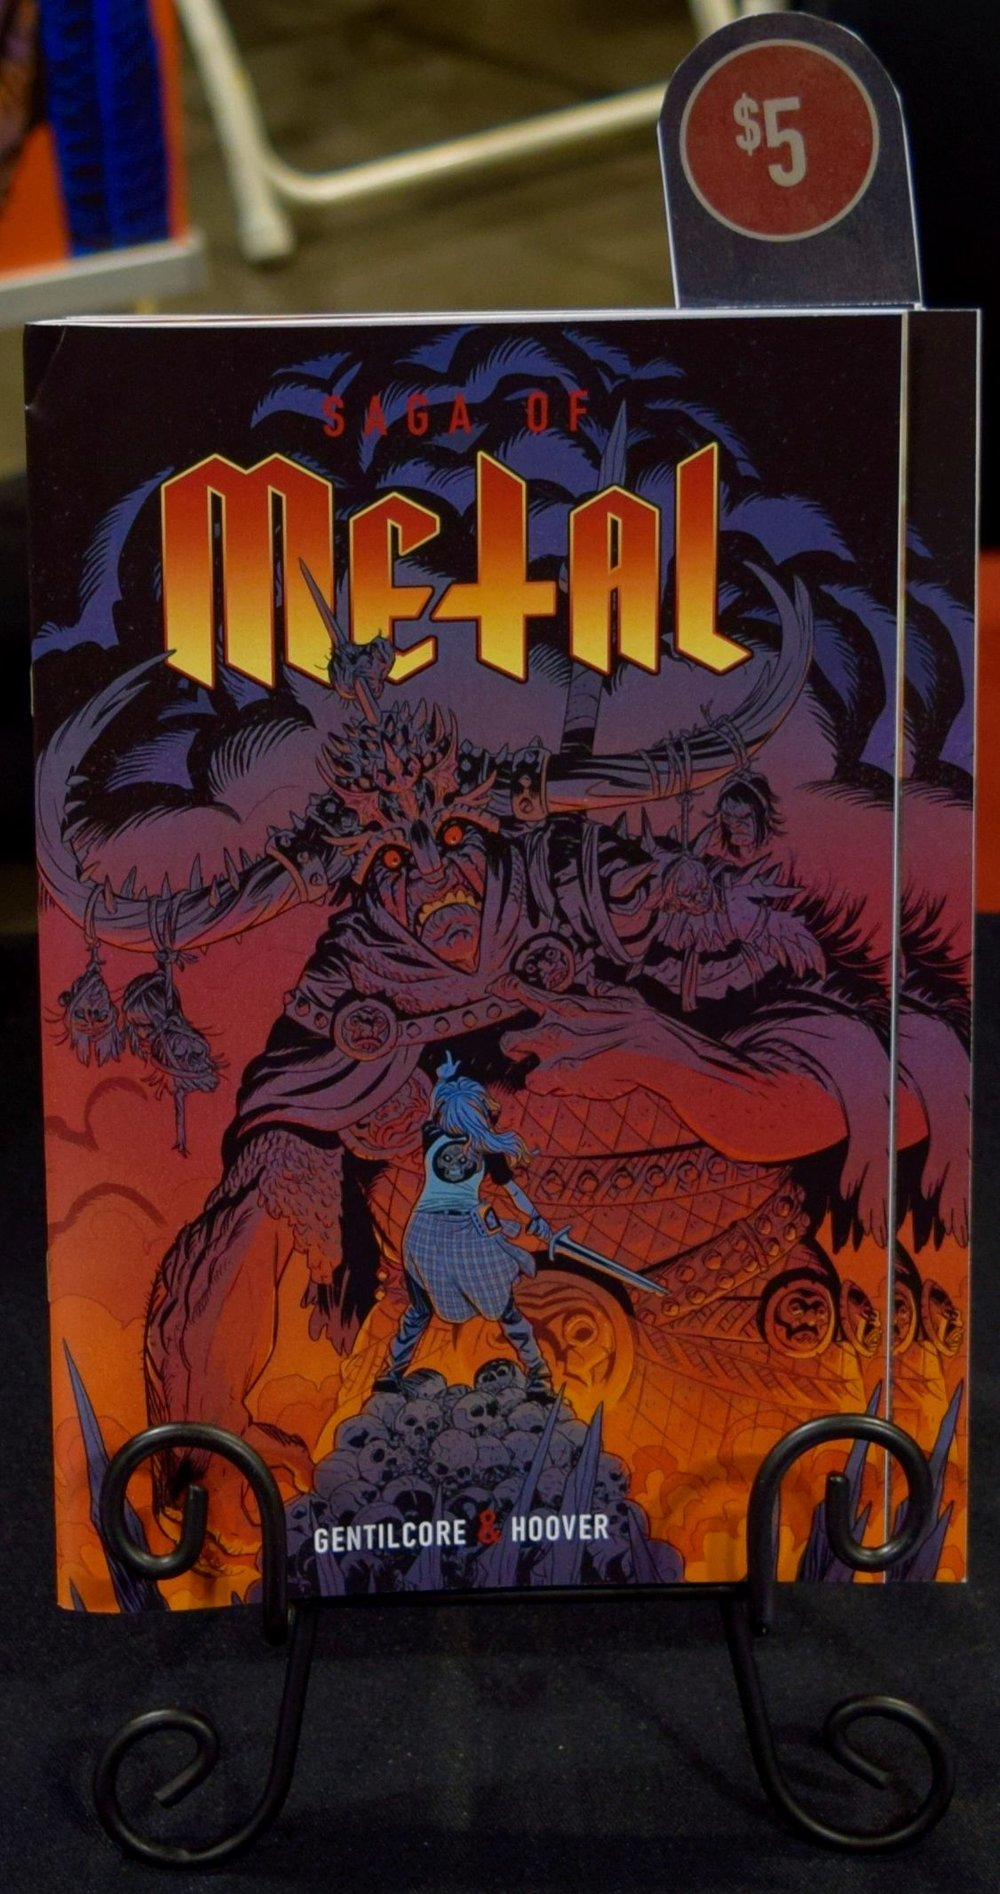 Saga of Metal #1 at Denver Comic Con 2016.